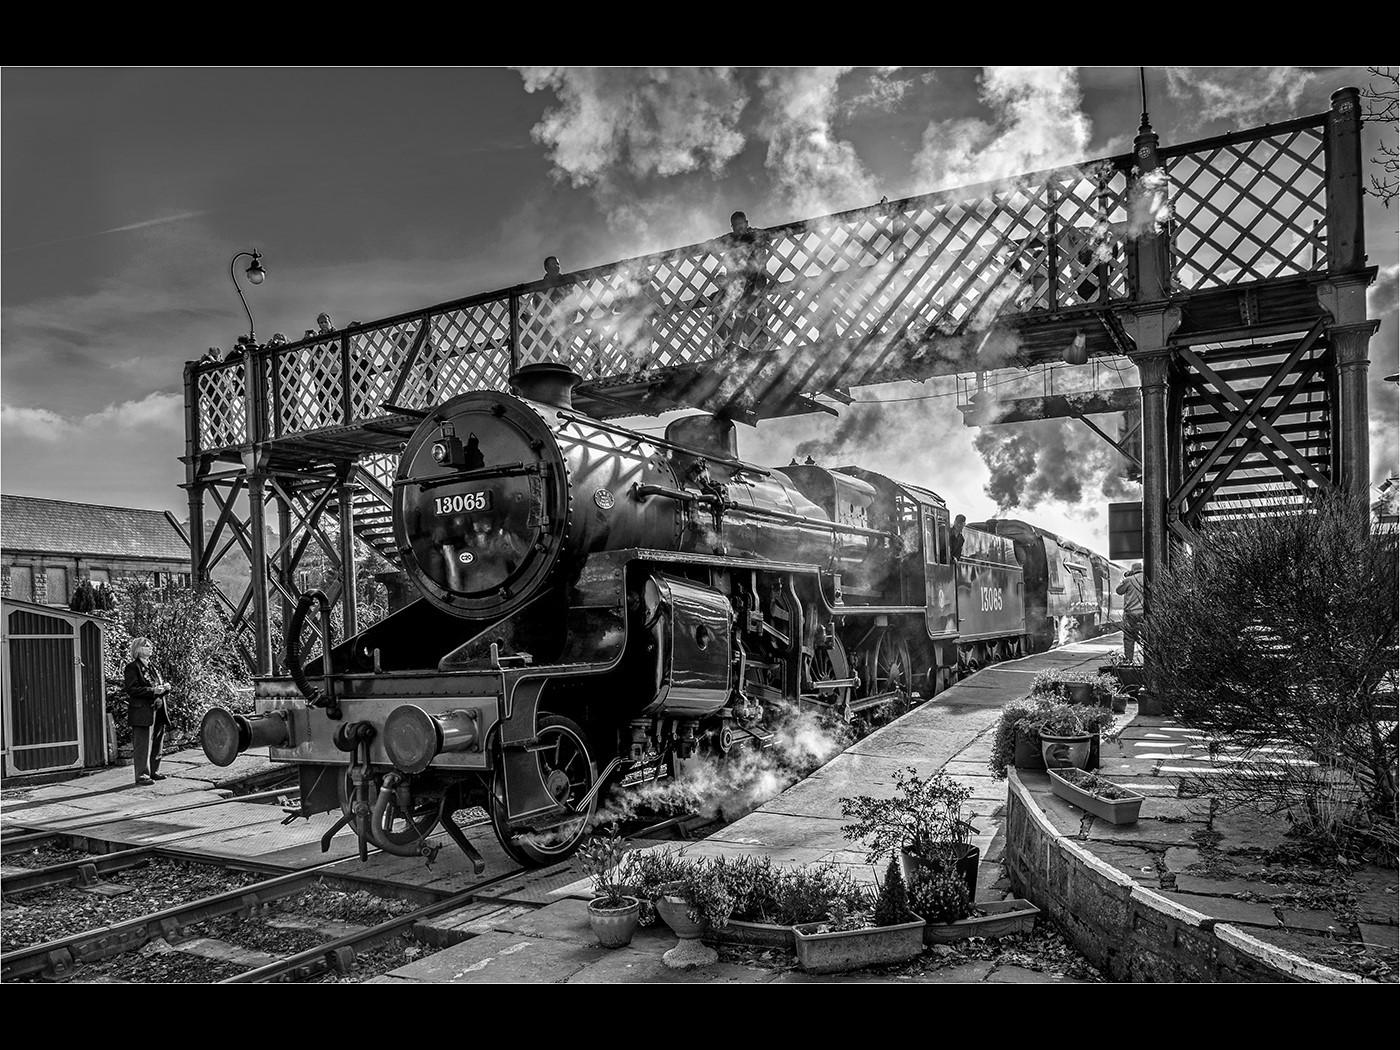 13065 Departs Ramsbottom